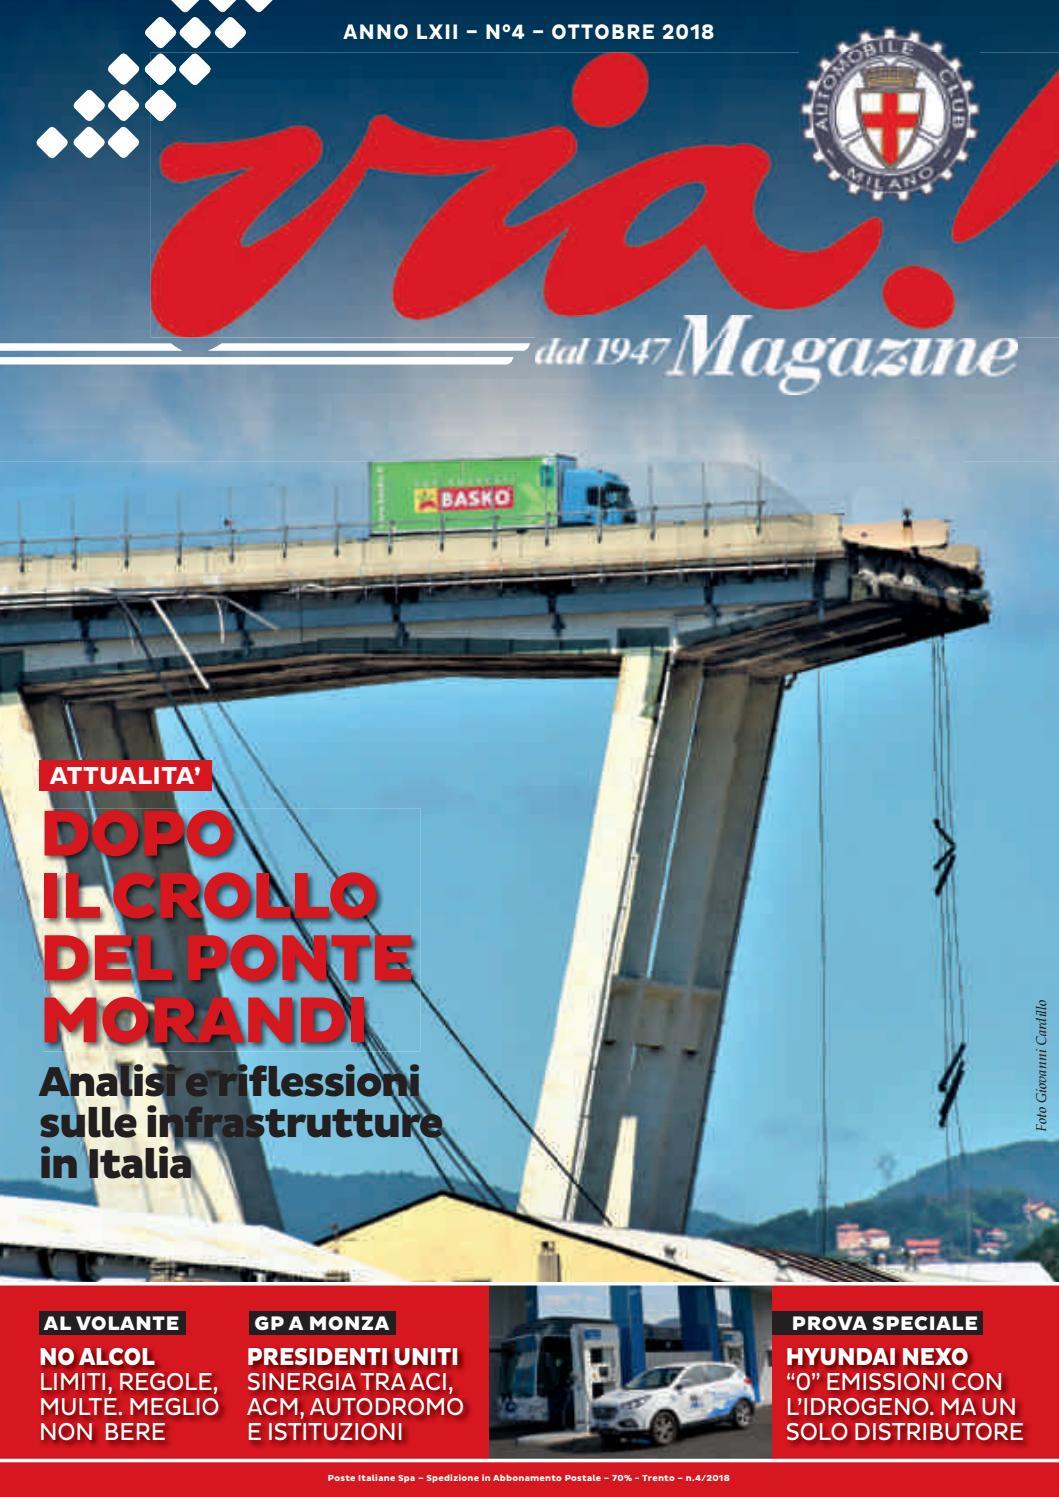 Sedile Imponente E Severo.Via N 4 2018 Ac Milano By Aci Issuu